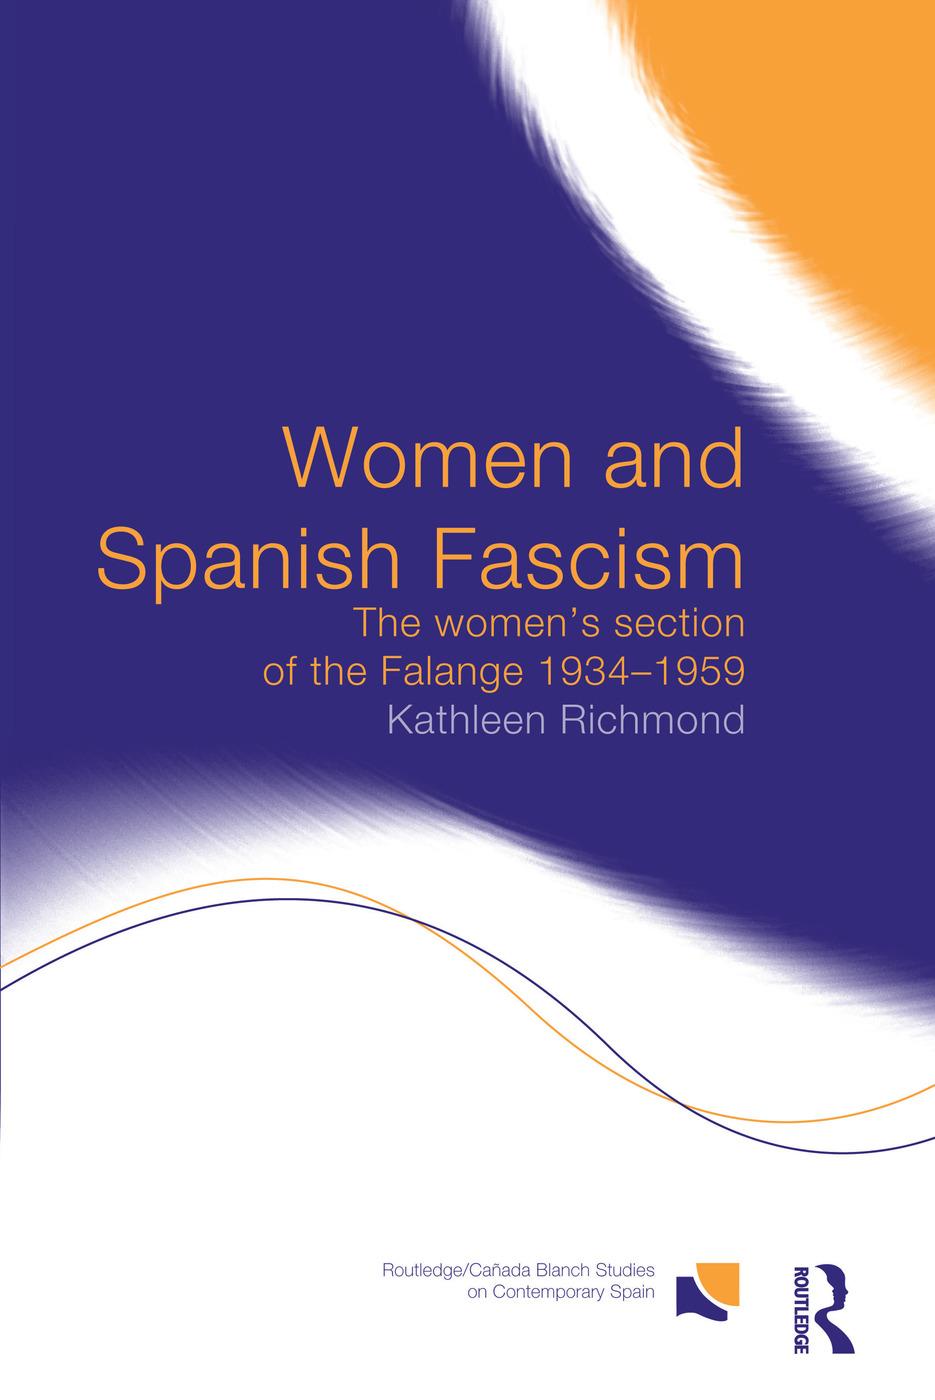 Women and Spanish Fascism